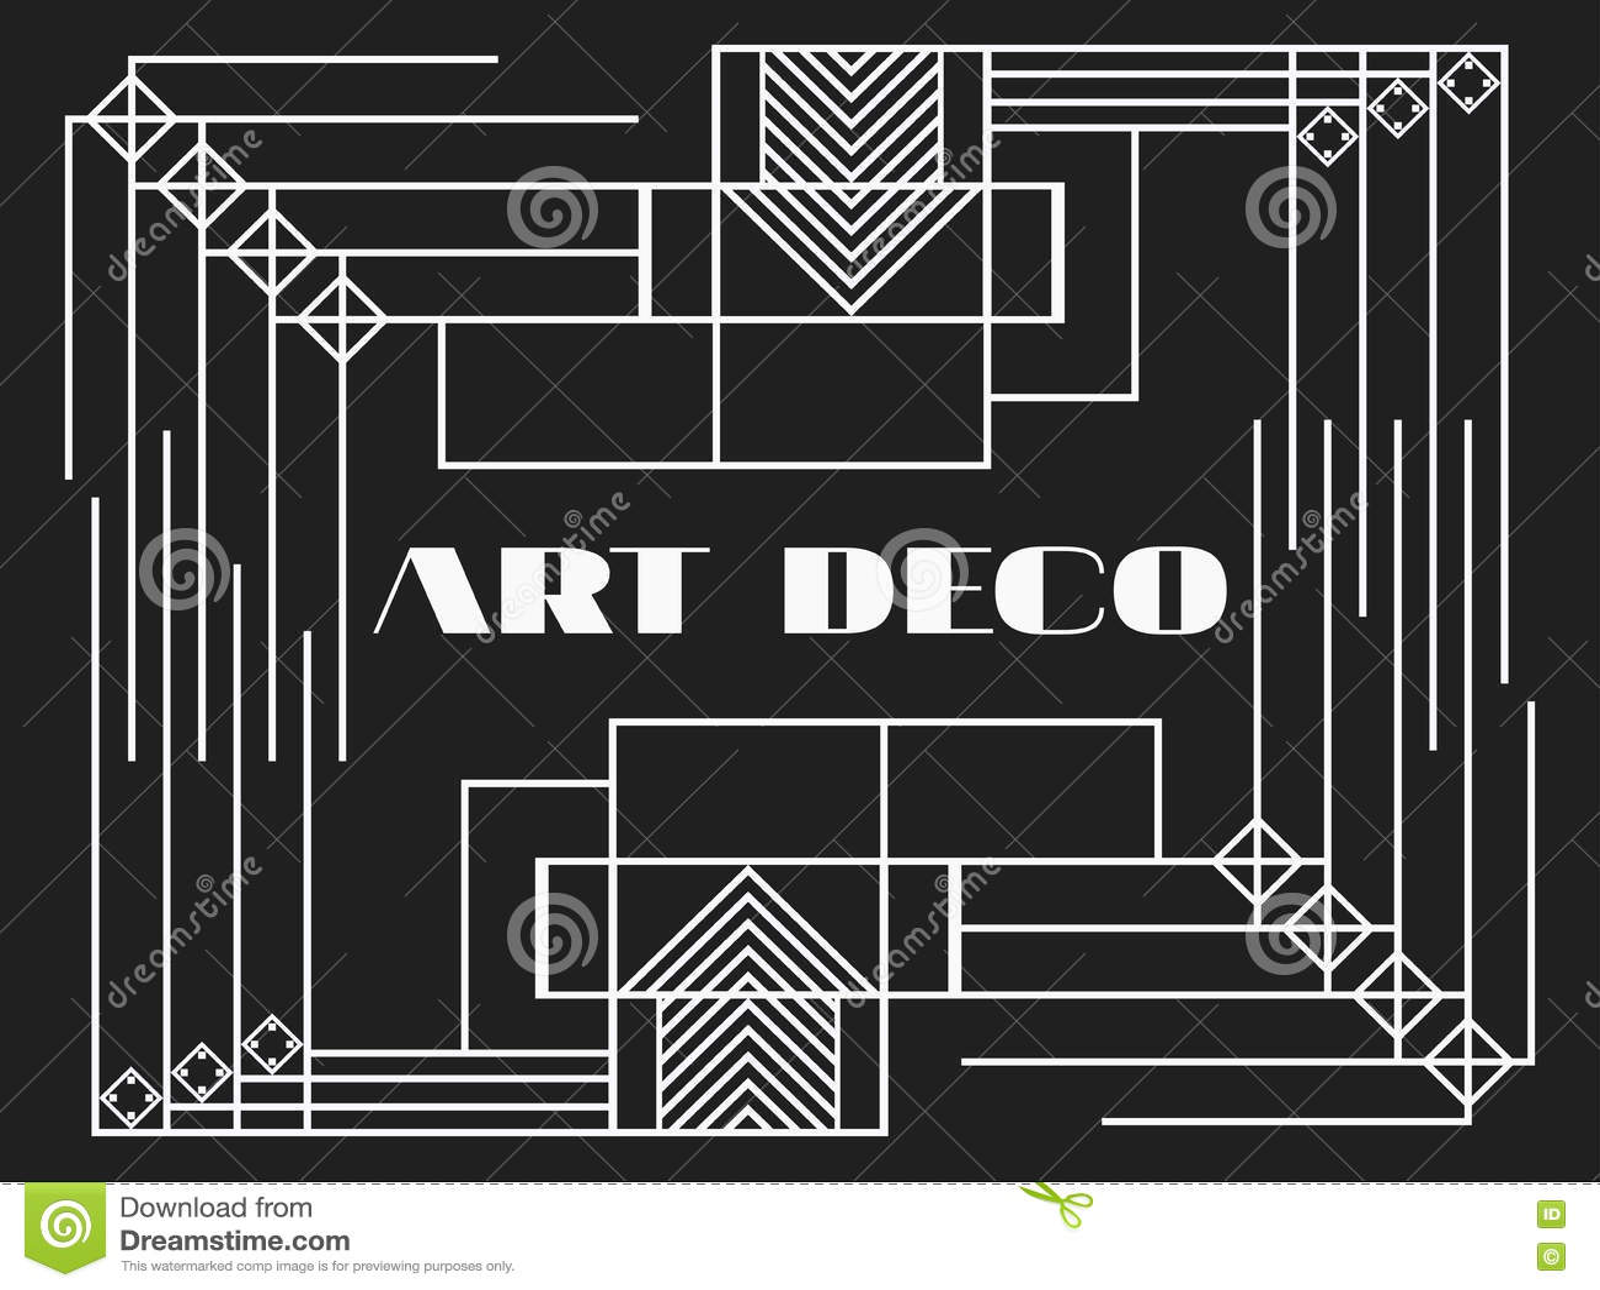 Art Deco Frame Art Deco Geometric Vintage Frame Retro Style Background Style 1920s 1930s Vector Stock Vector Illustration Of Beautiful Modern 79379235